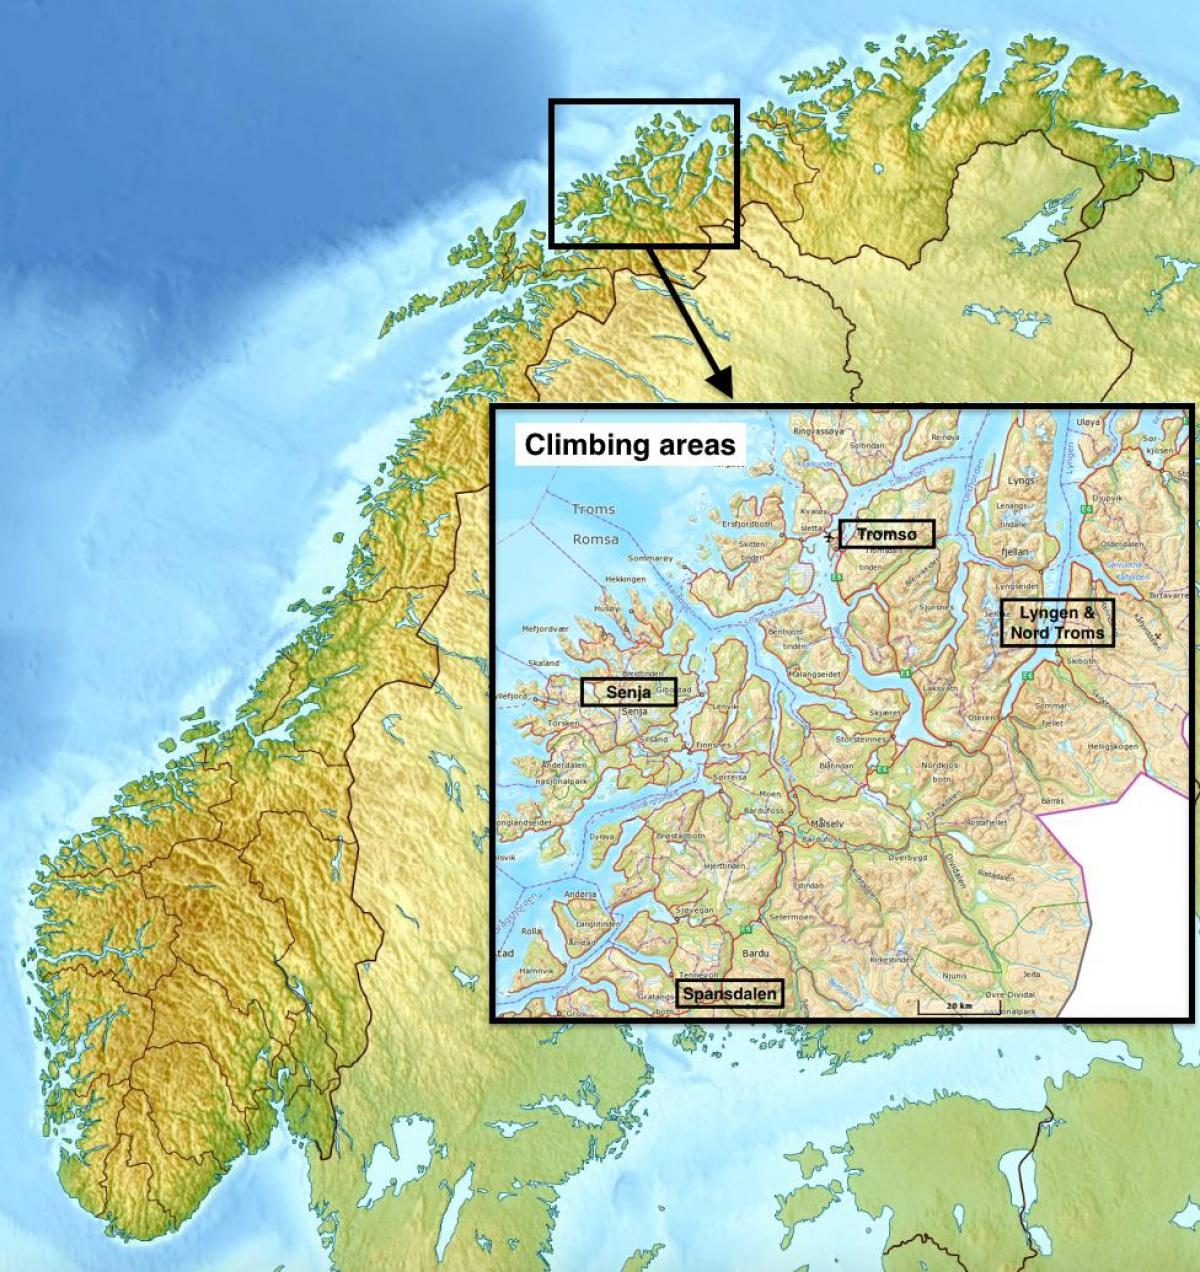 Tromssa Norja Kartta Tromssa Norja Kartta Pohjois Eurooppa